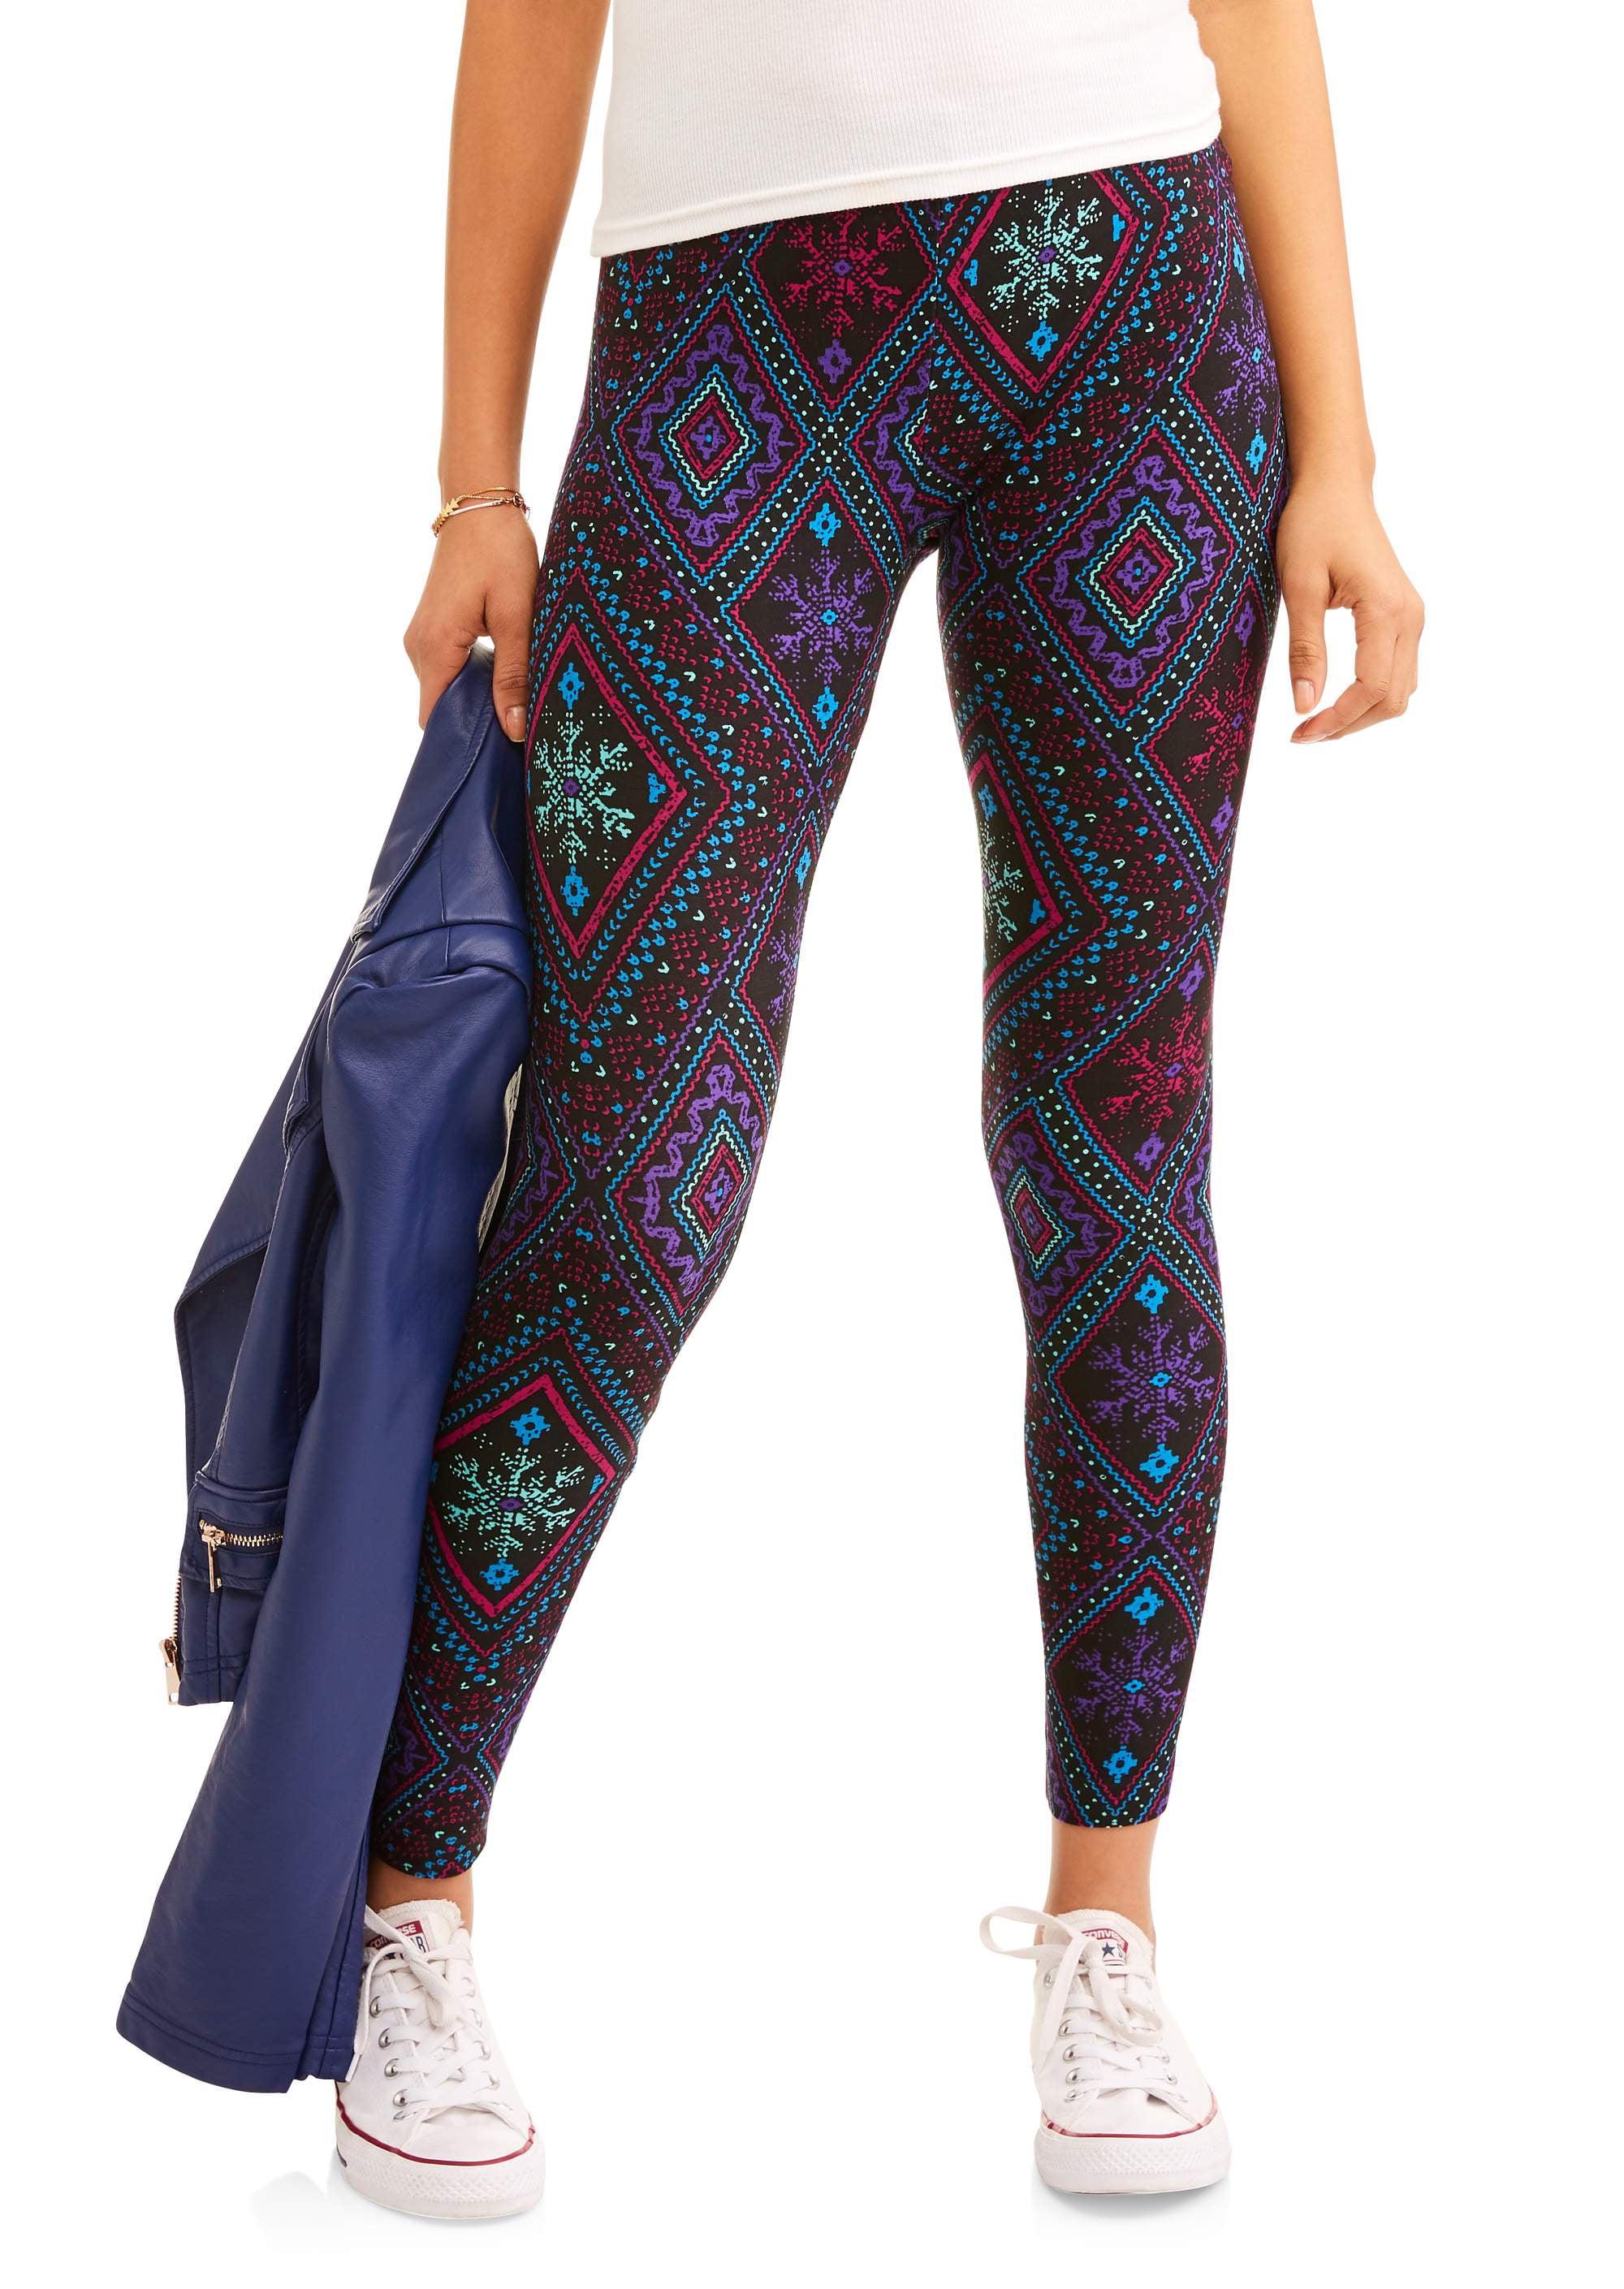 af45d80eb1aecd Juniors' Sueded Jersey Leggings – Walmart Inventory Checker – BrickSeek